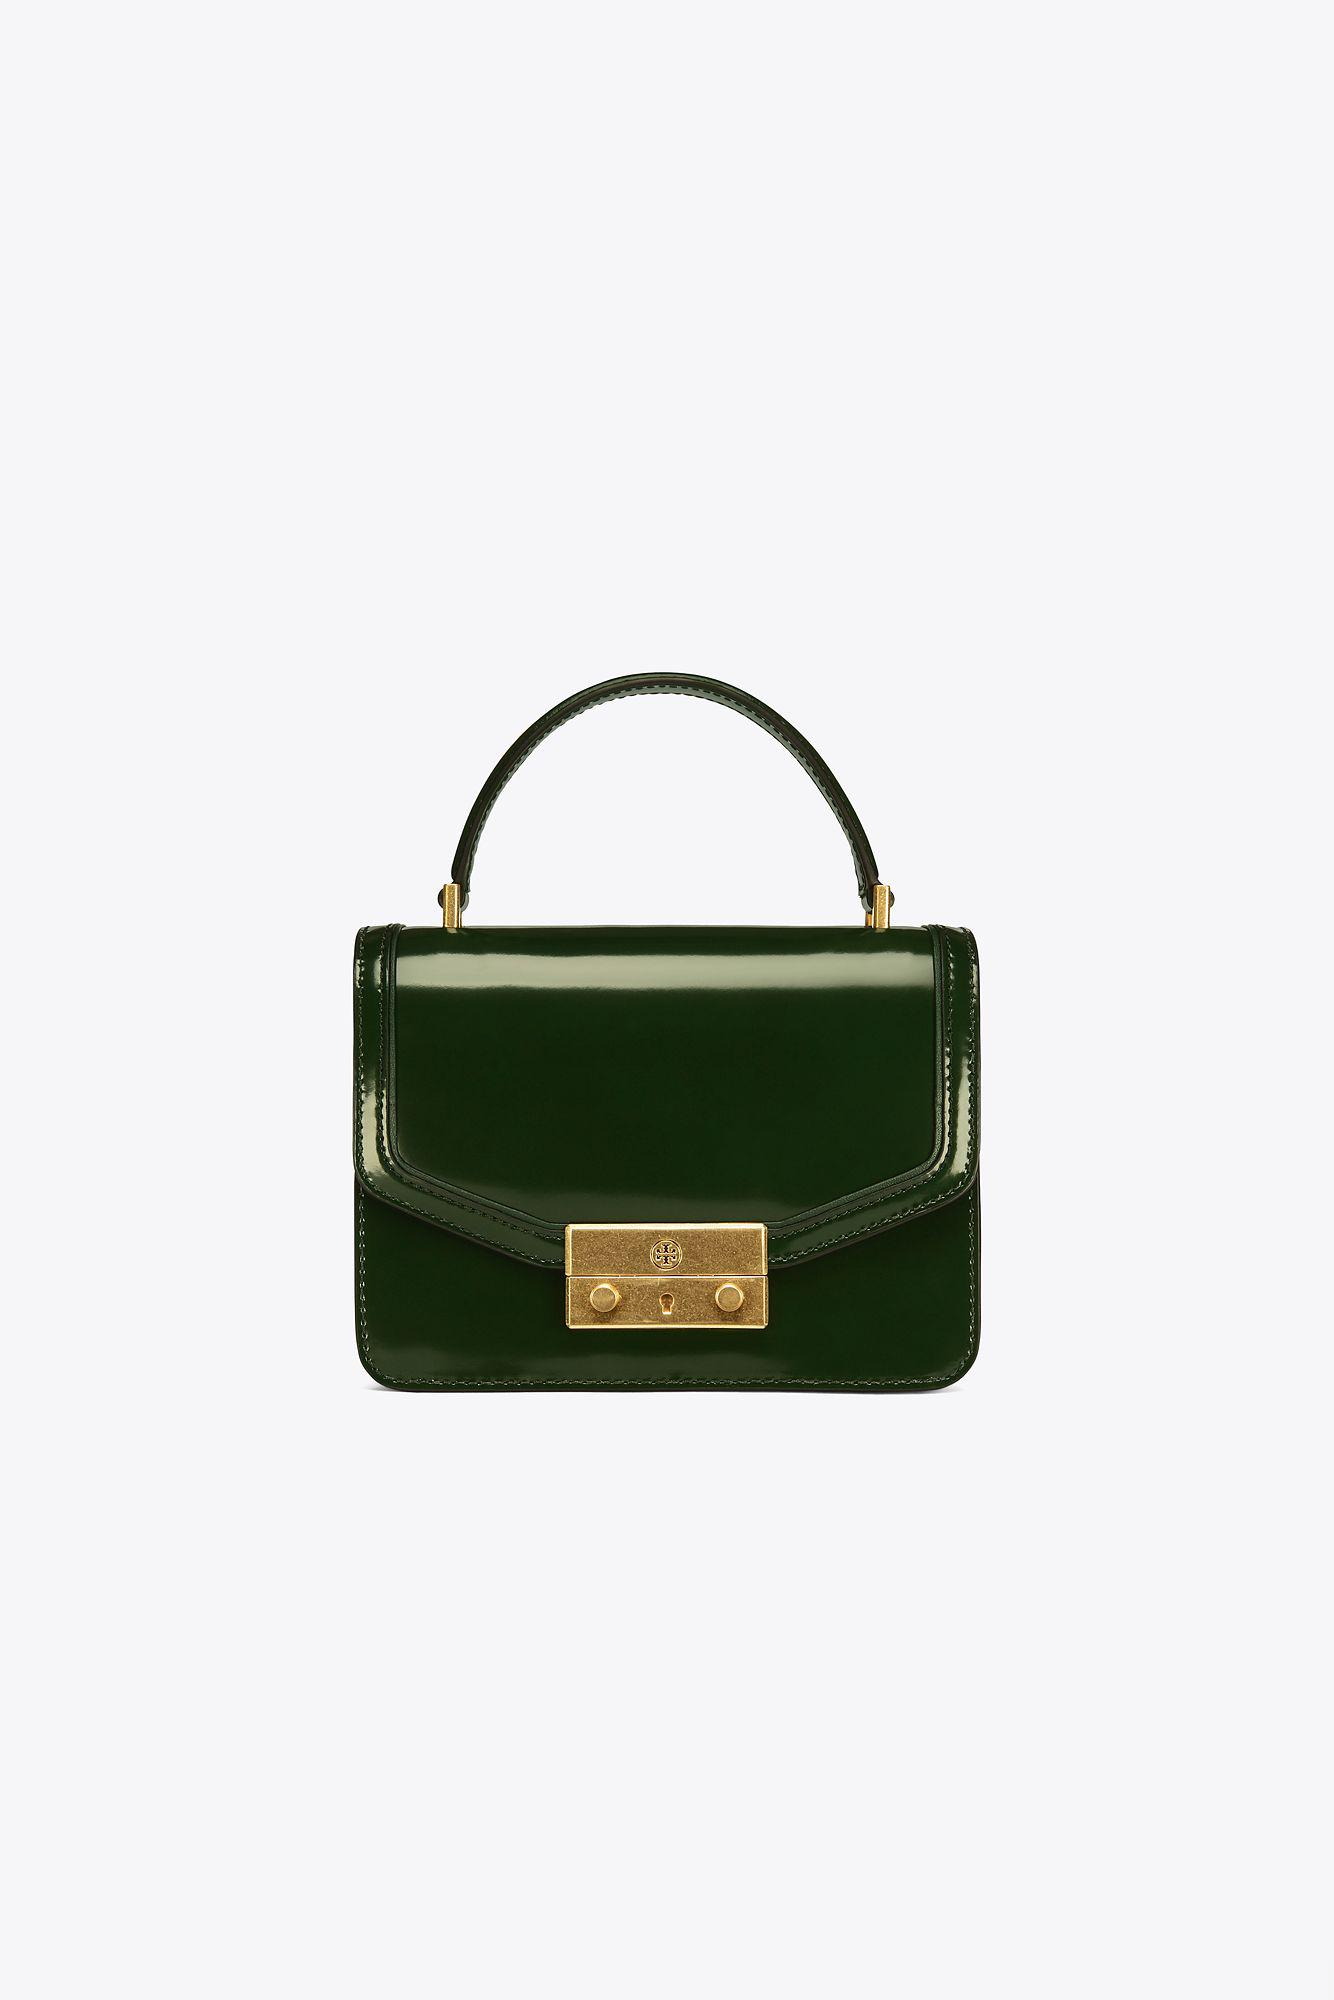 9742578a3c3 Tory Burch Juliette Mini Top-handle Satchel in Green - Lyst